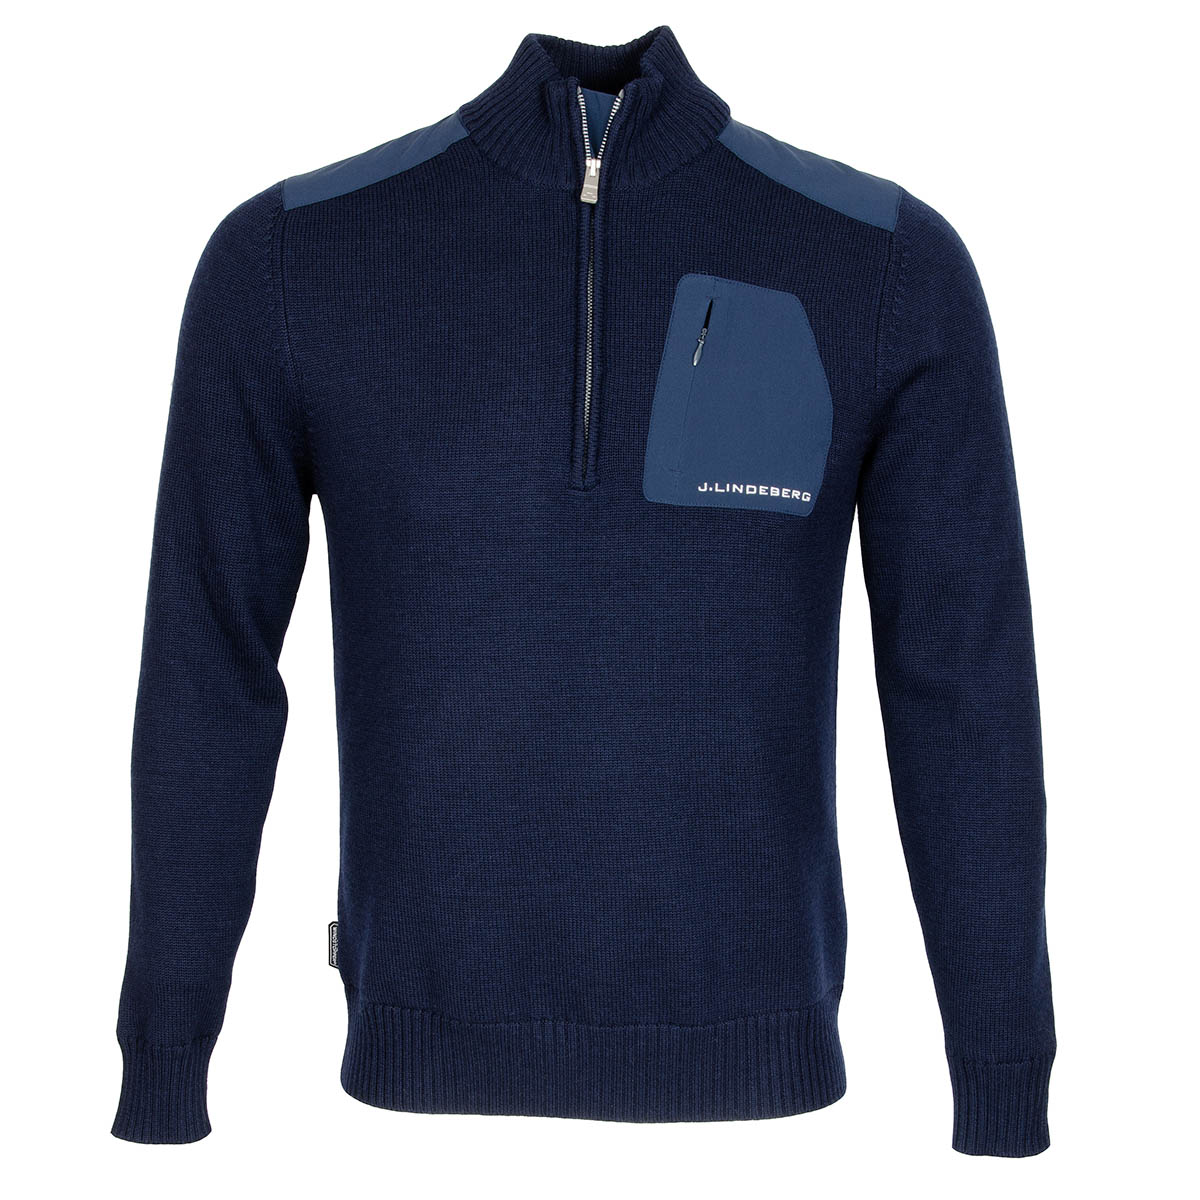 J Lindeberg Windstopper Knitted Sweater Navy/Purple ...